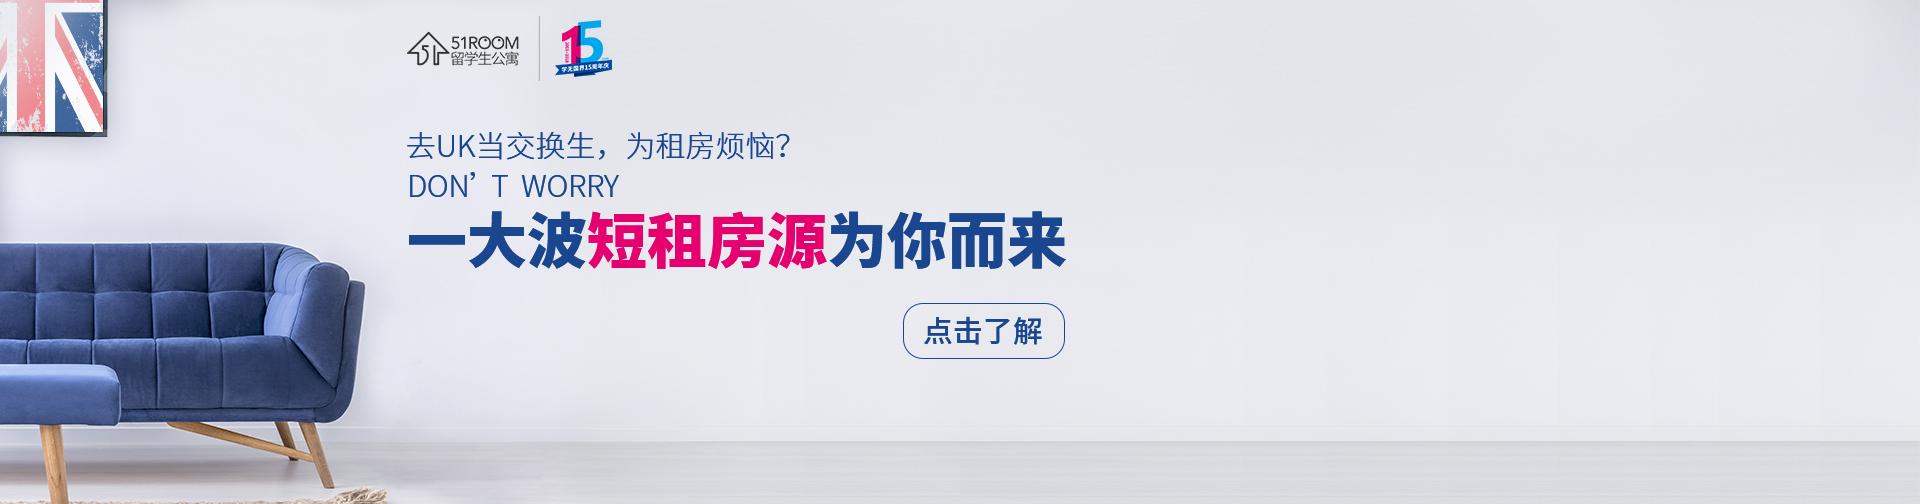 http://myoffer-public.oss-cn-shenzhen.aliyuncs.com/banners/e5f91424c4893063c36f5fce8aeee4ff-328686-1920x504.jpeg